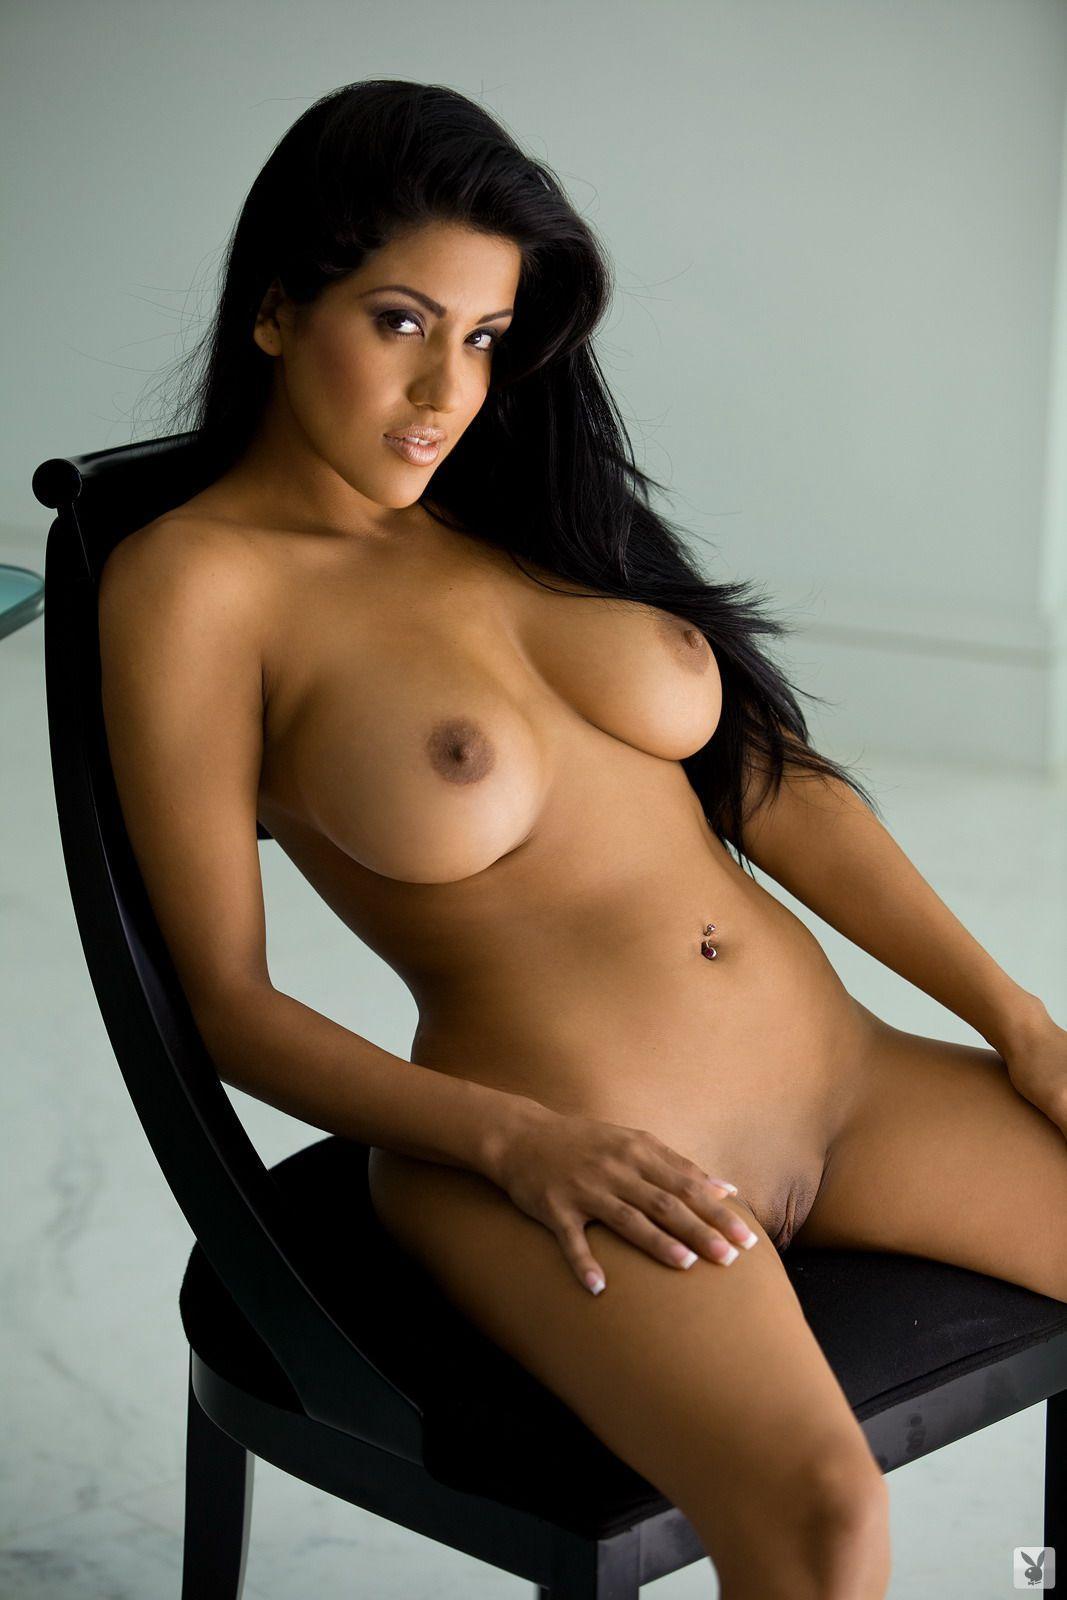 Semi sex young girl hot porn